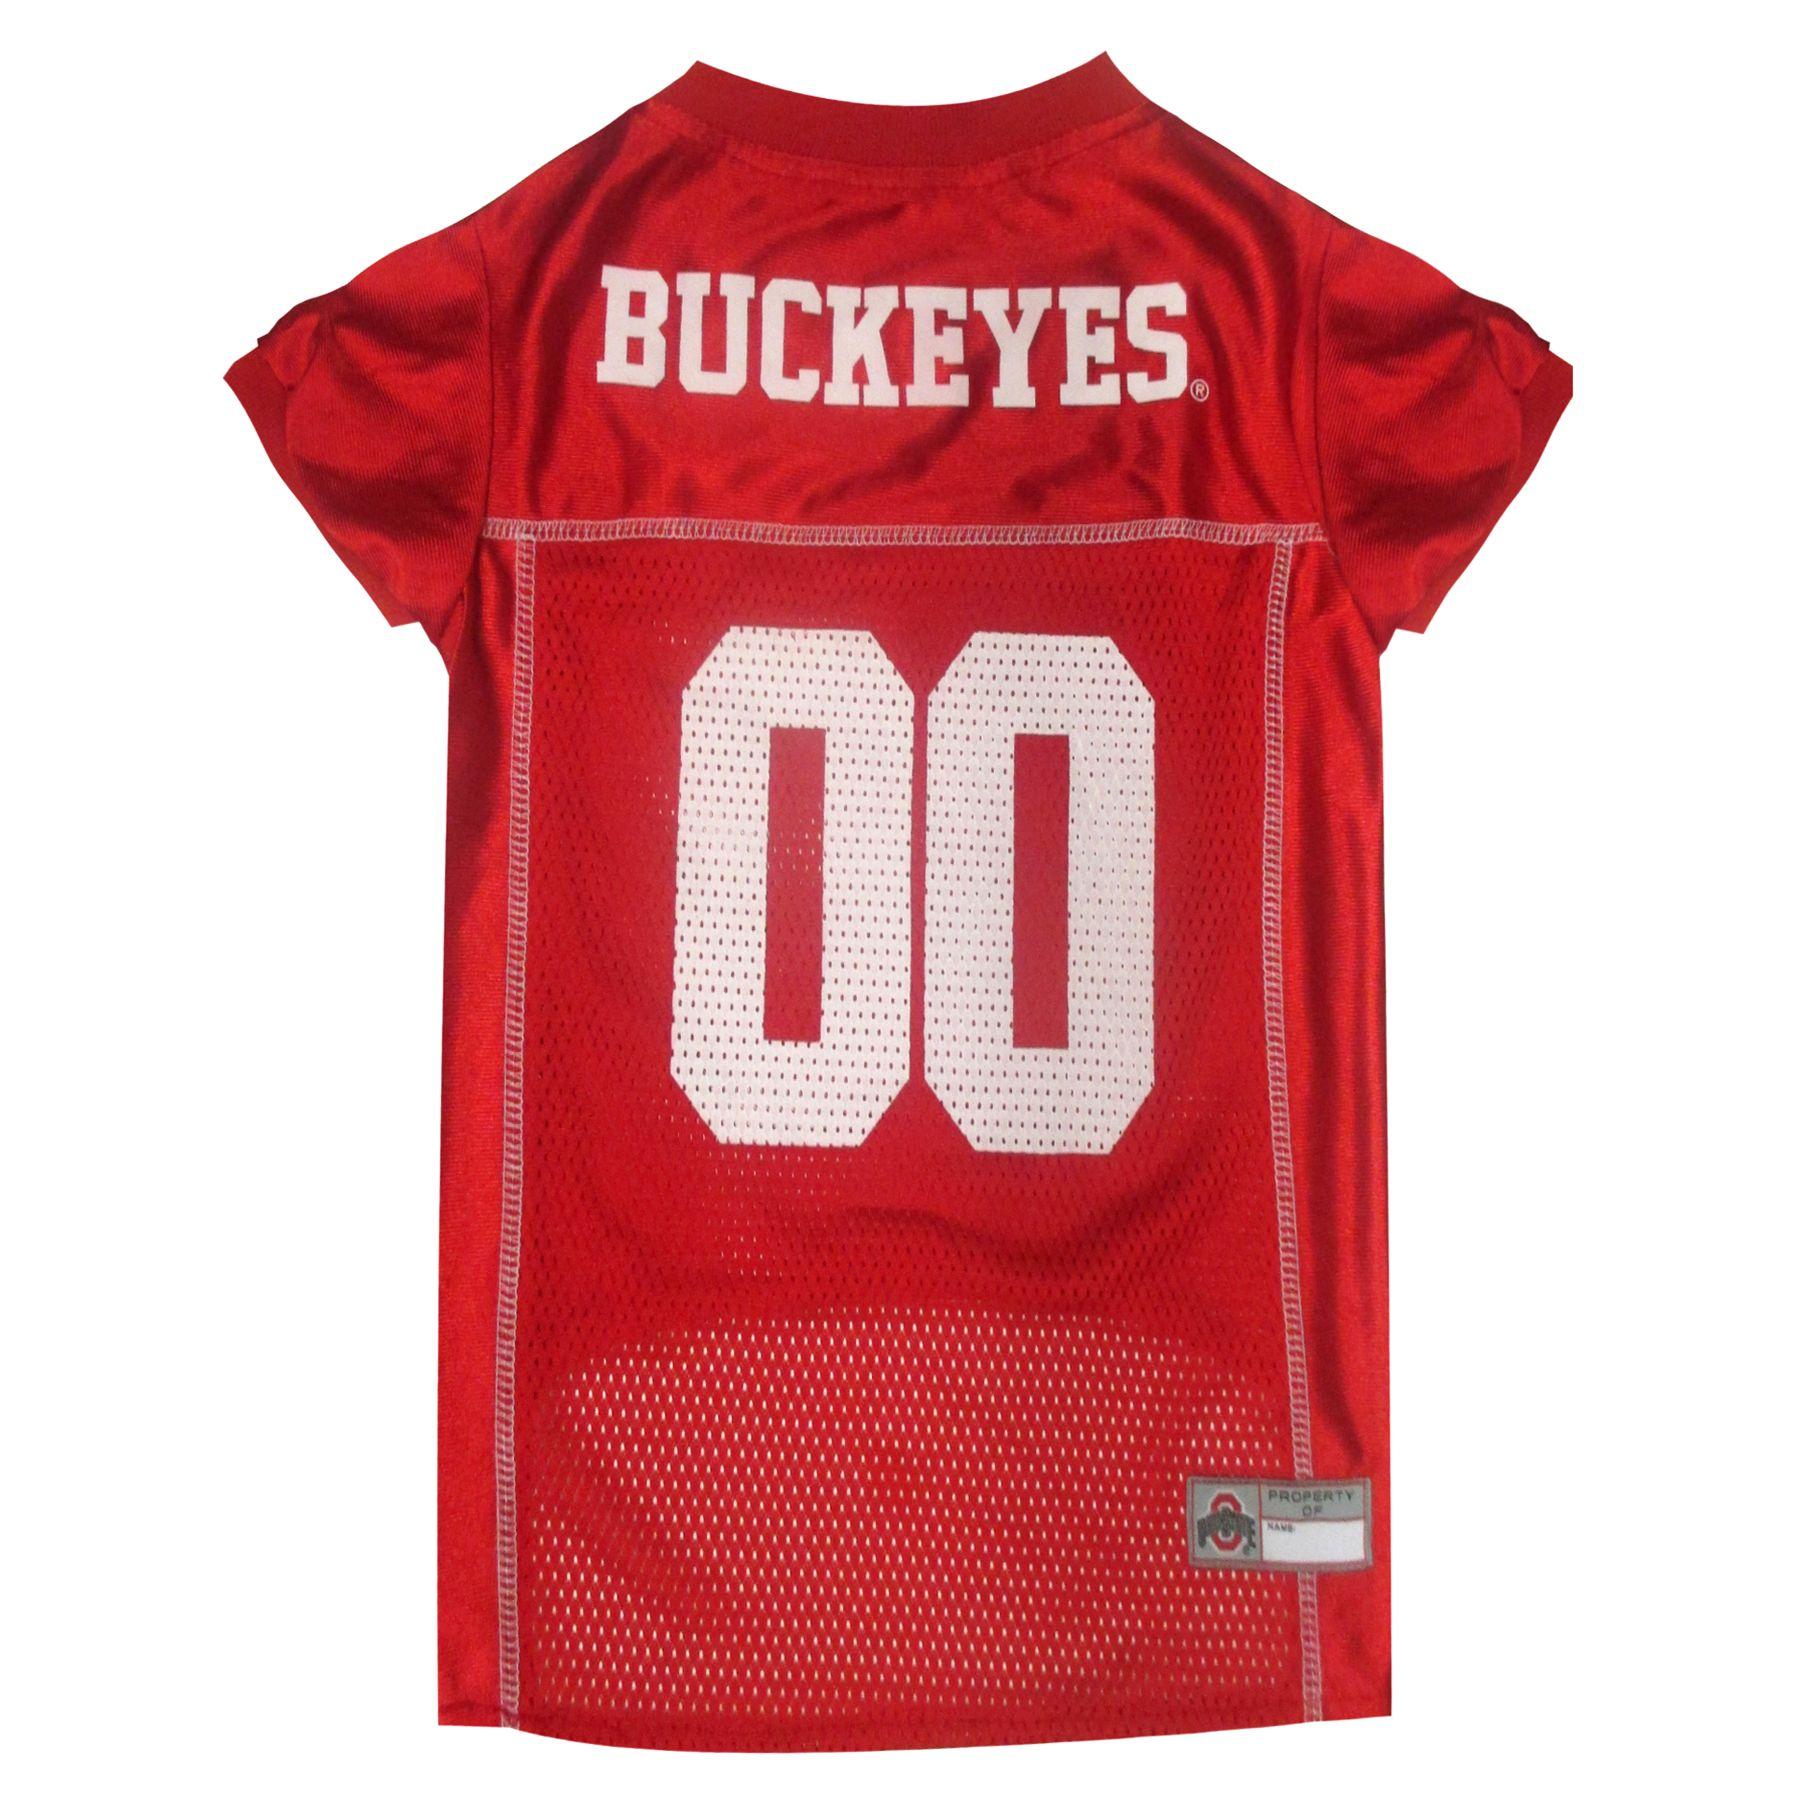 Ohio State University Buckeyes Ncaa Jersey size: X Small 5217727